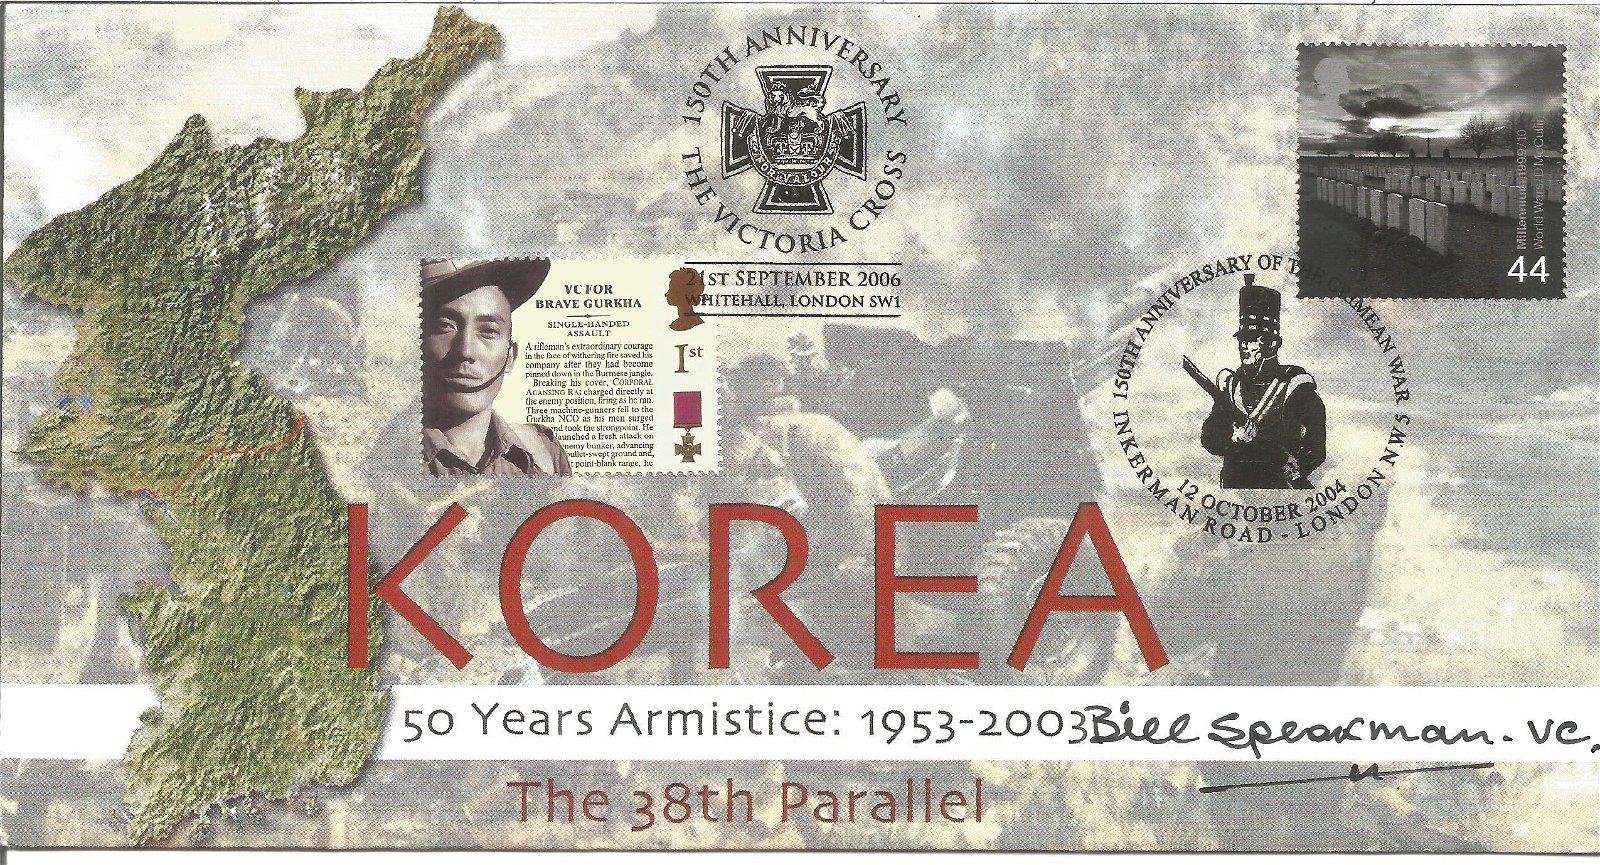 Bill Speakman VC signed Korea 50 Years Armistice 1953 -